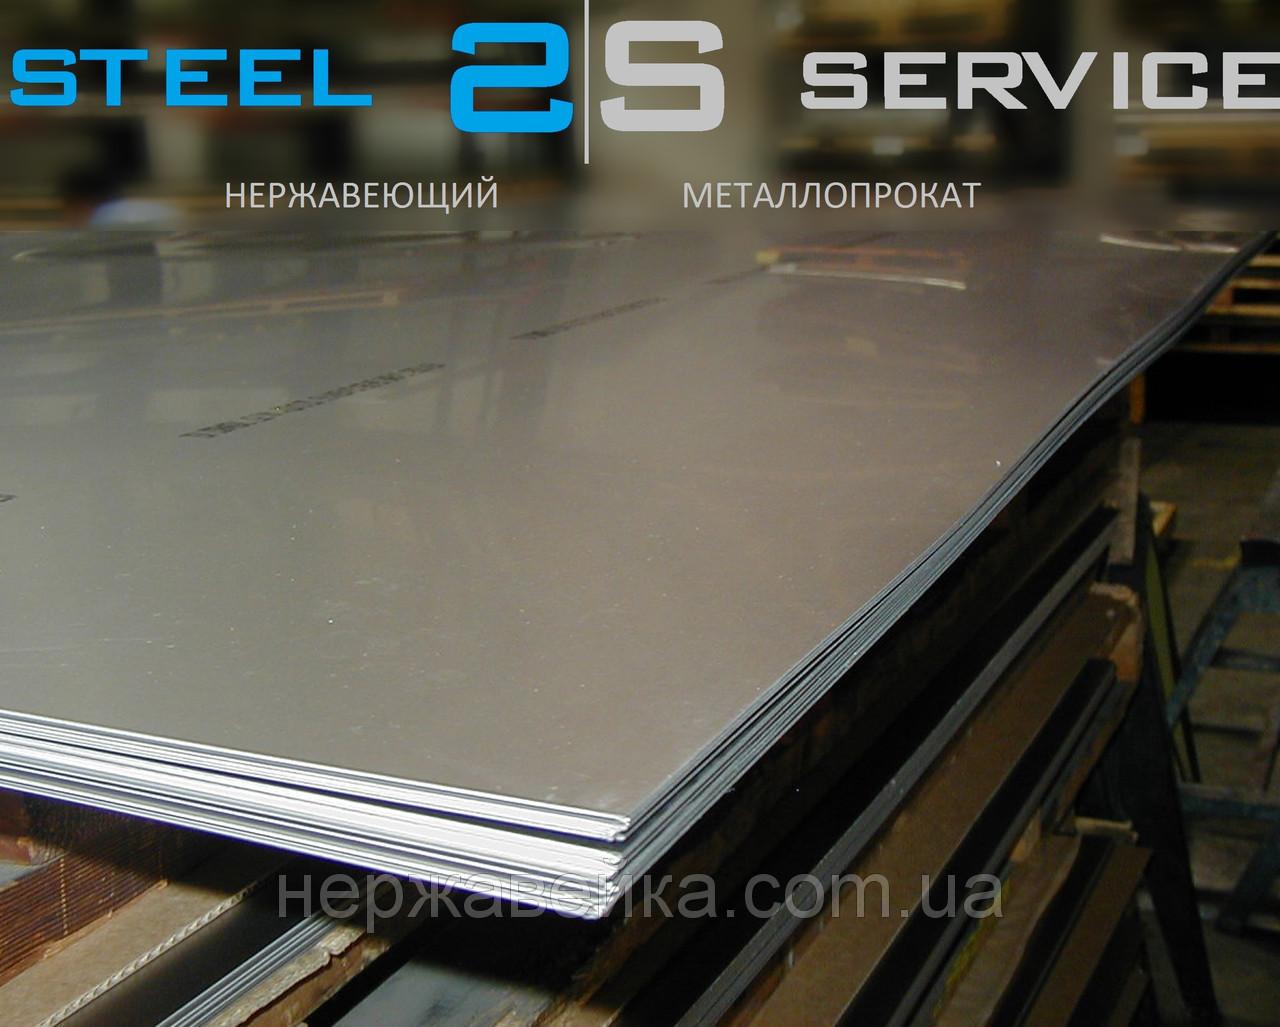 Нержавеющий лист 0,8х1000х2000мм  AISI 316L(03Х17Н14М3) 4N - шлифованный,  кислотостойкий